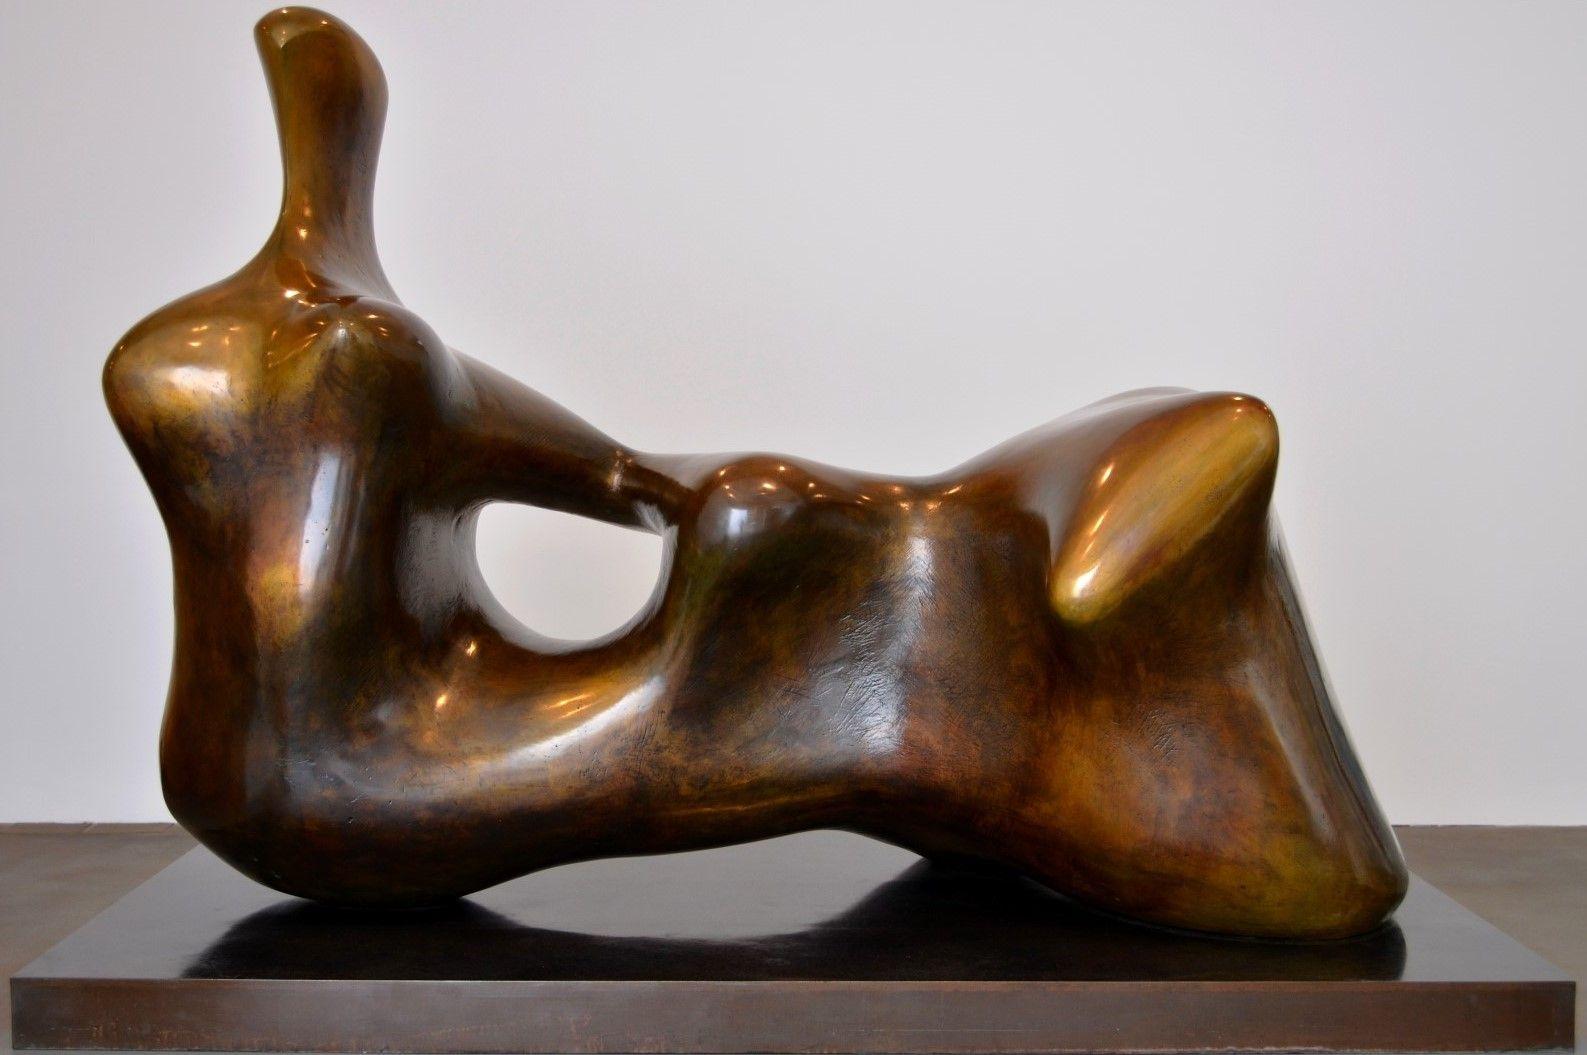 HENRY MOORE Reclining Figure Hand 1979 Bronze & HENRY MOORE Reclining Figure: Hand 1979 Bronze | MODERNIST ART ... islam-shia.org